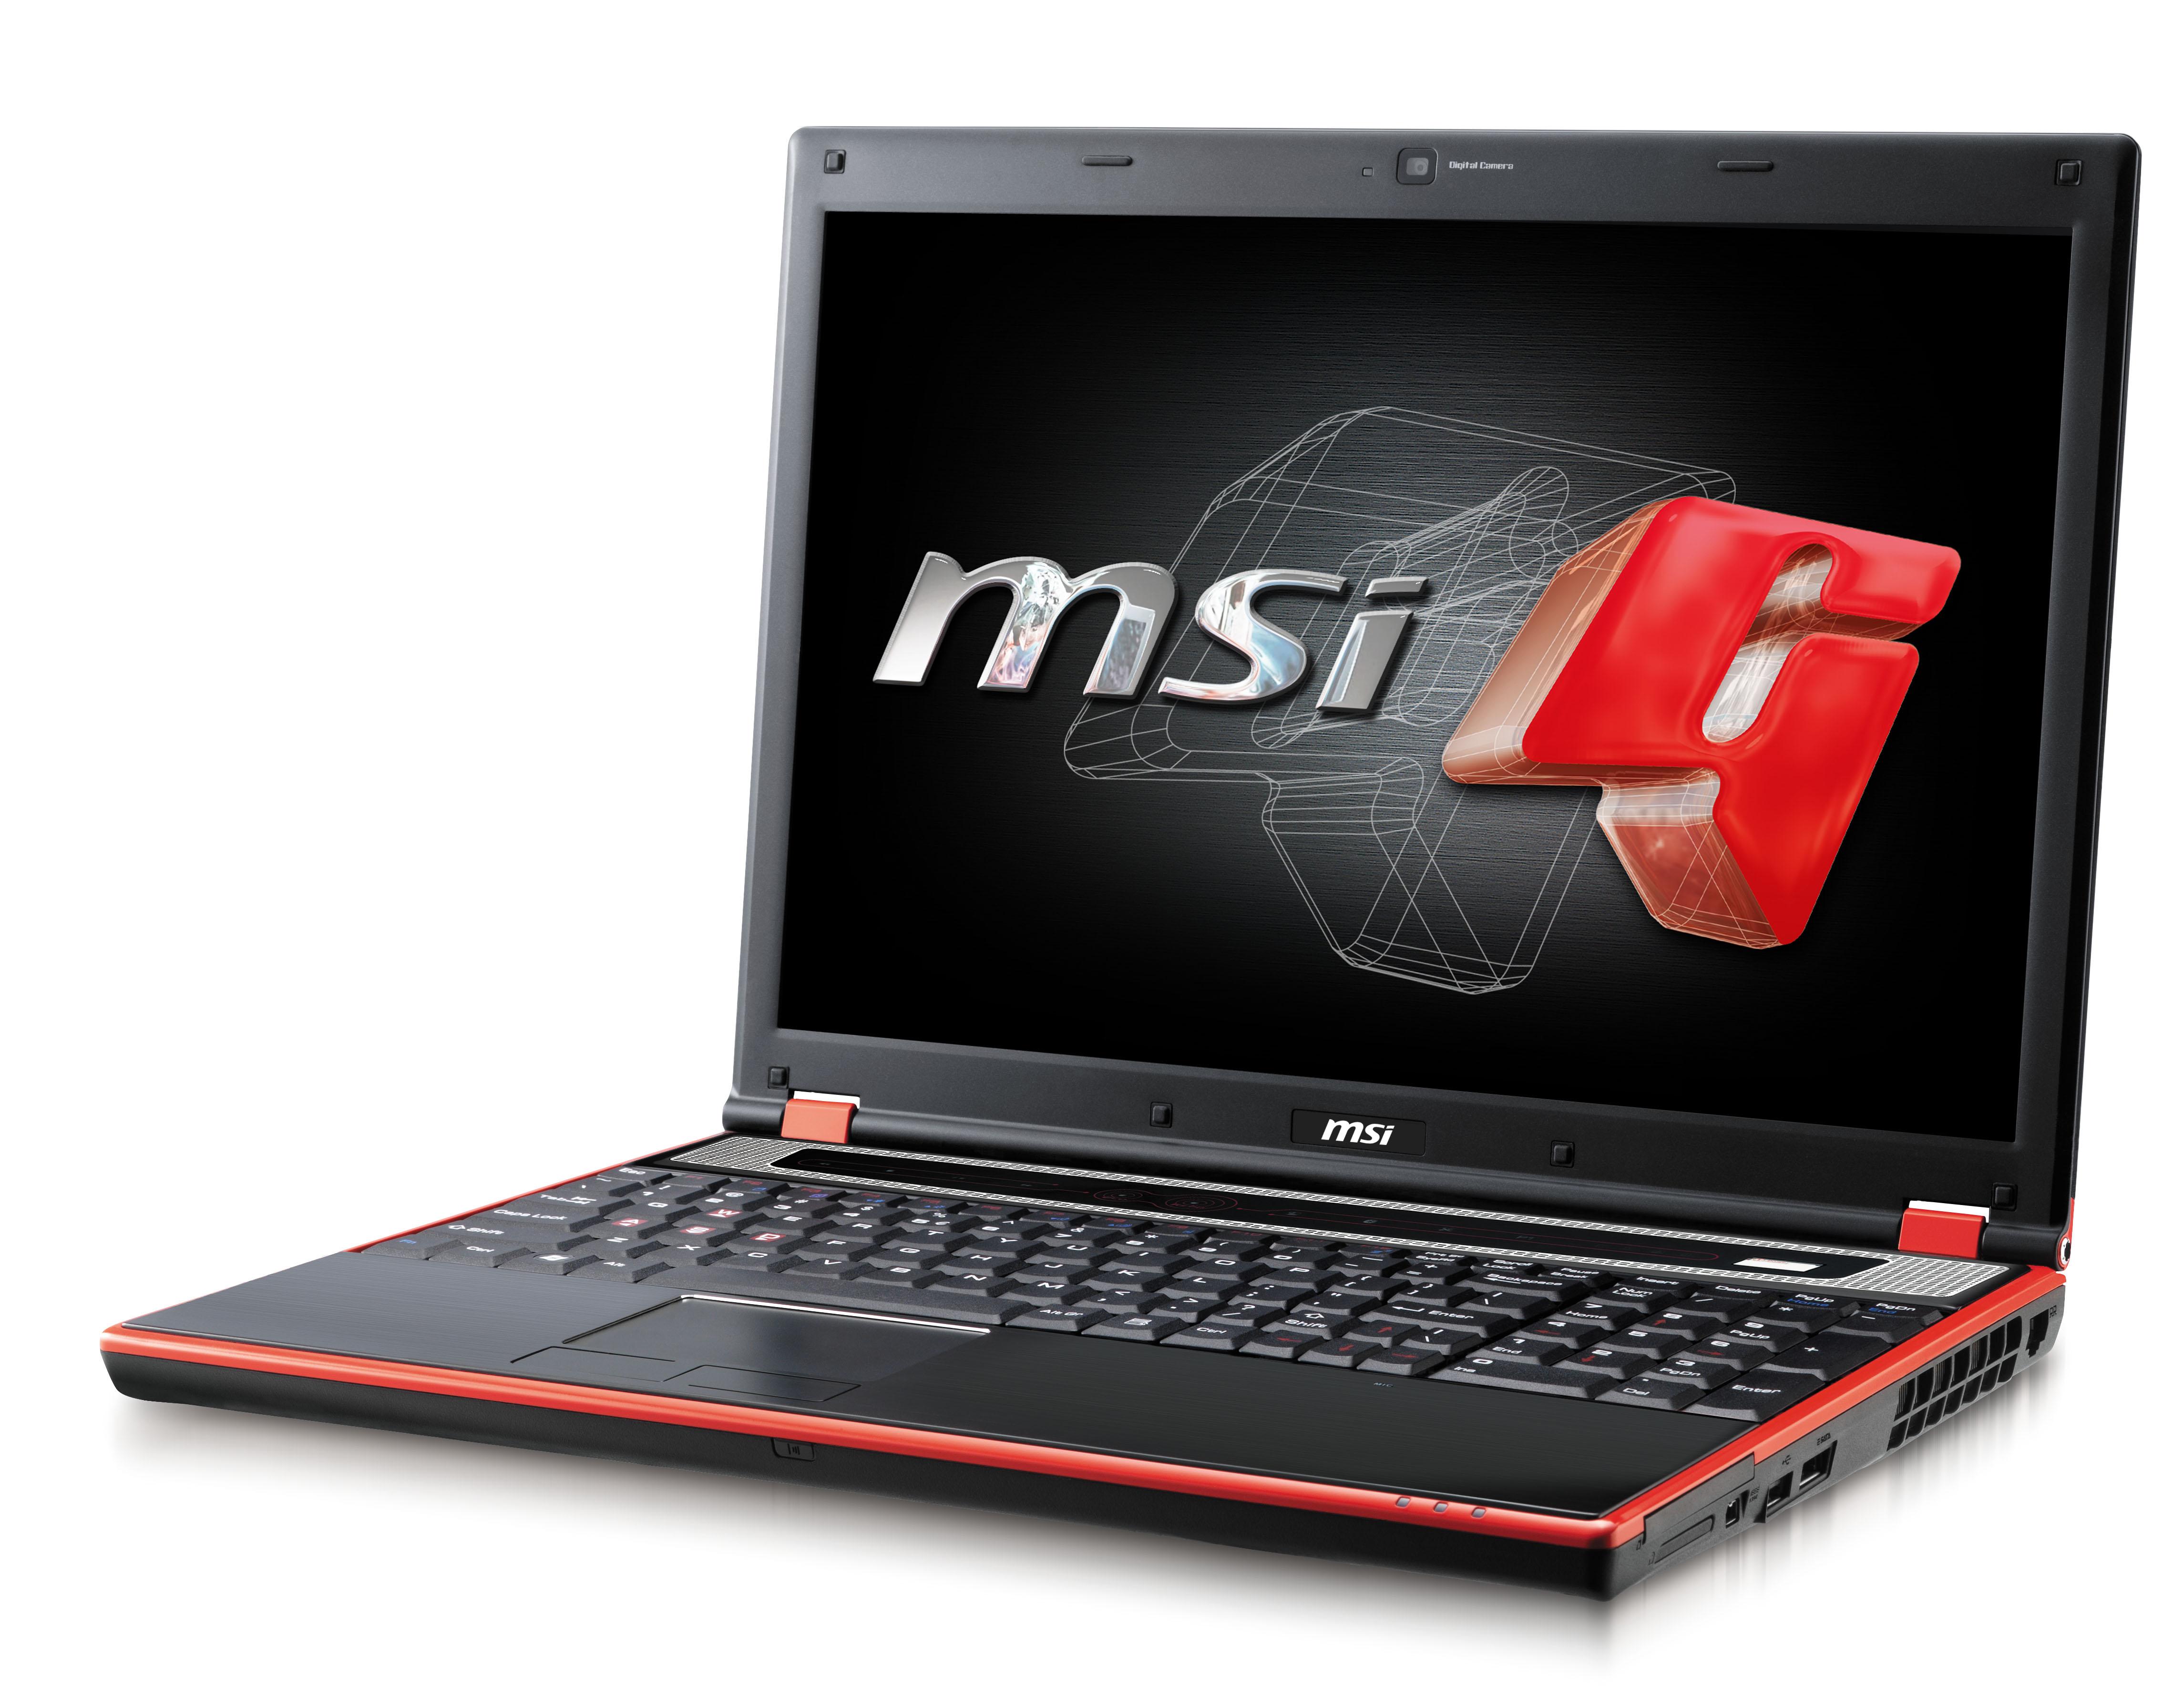 MSI GX740 Notebook ATI VGA Download Driver